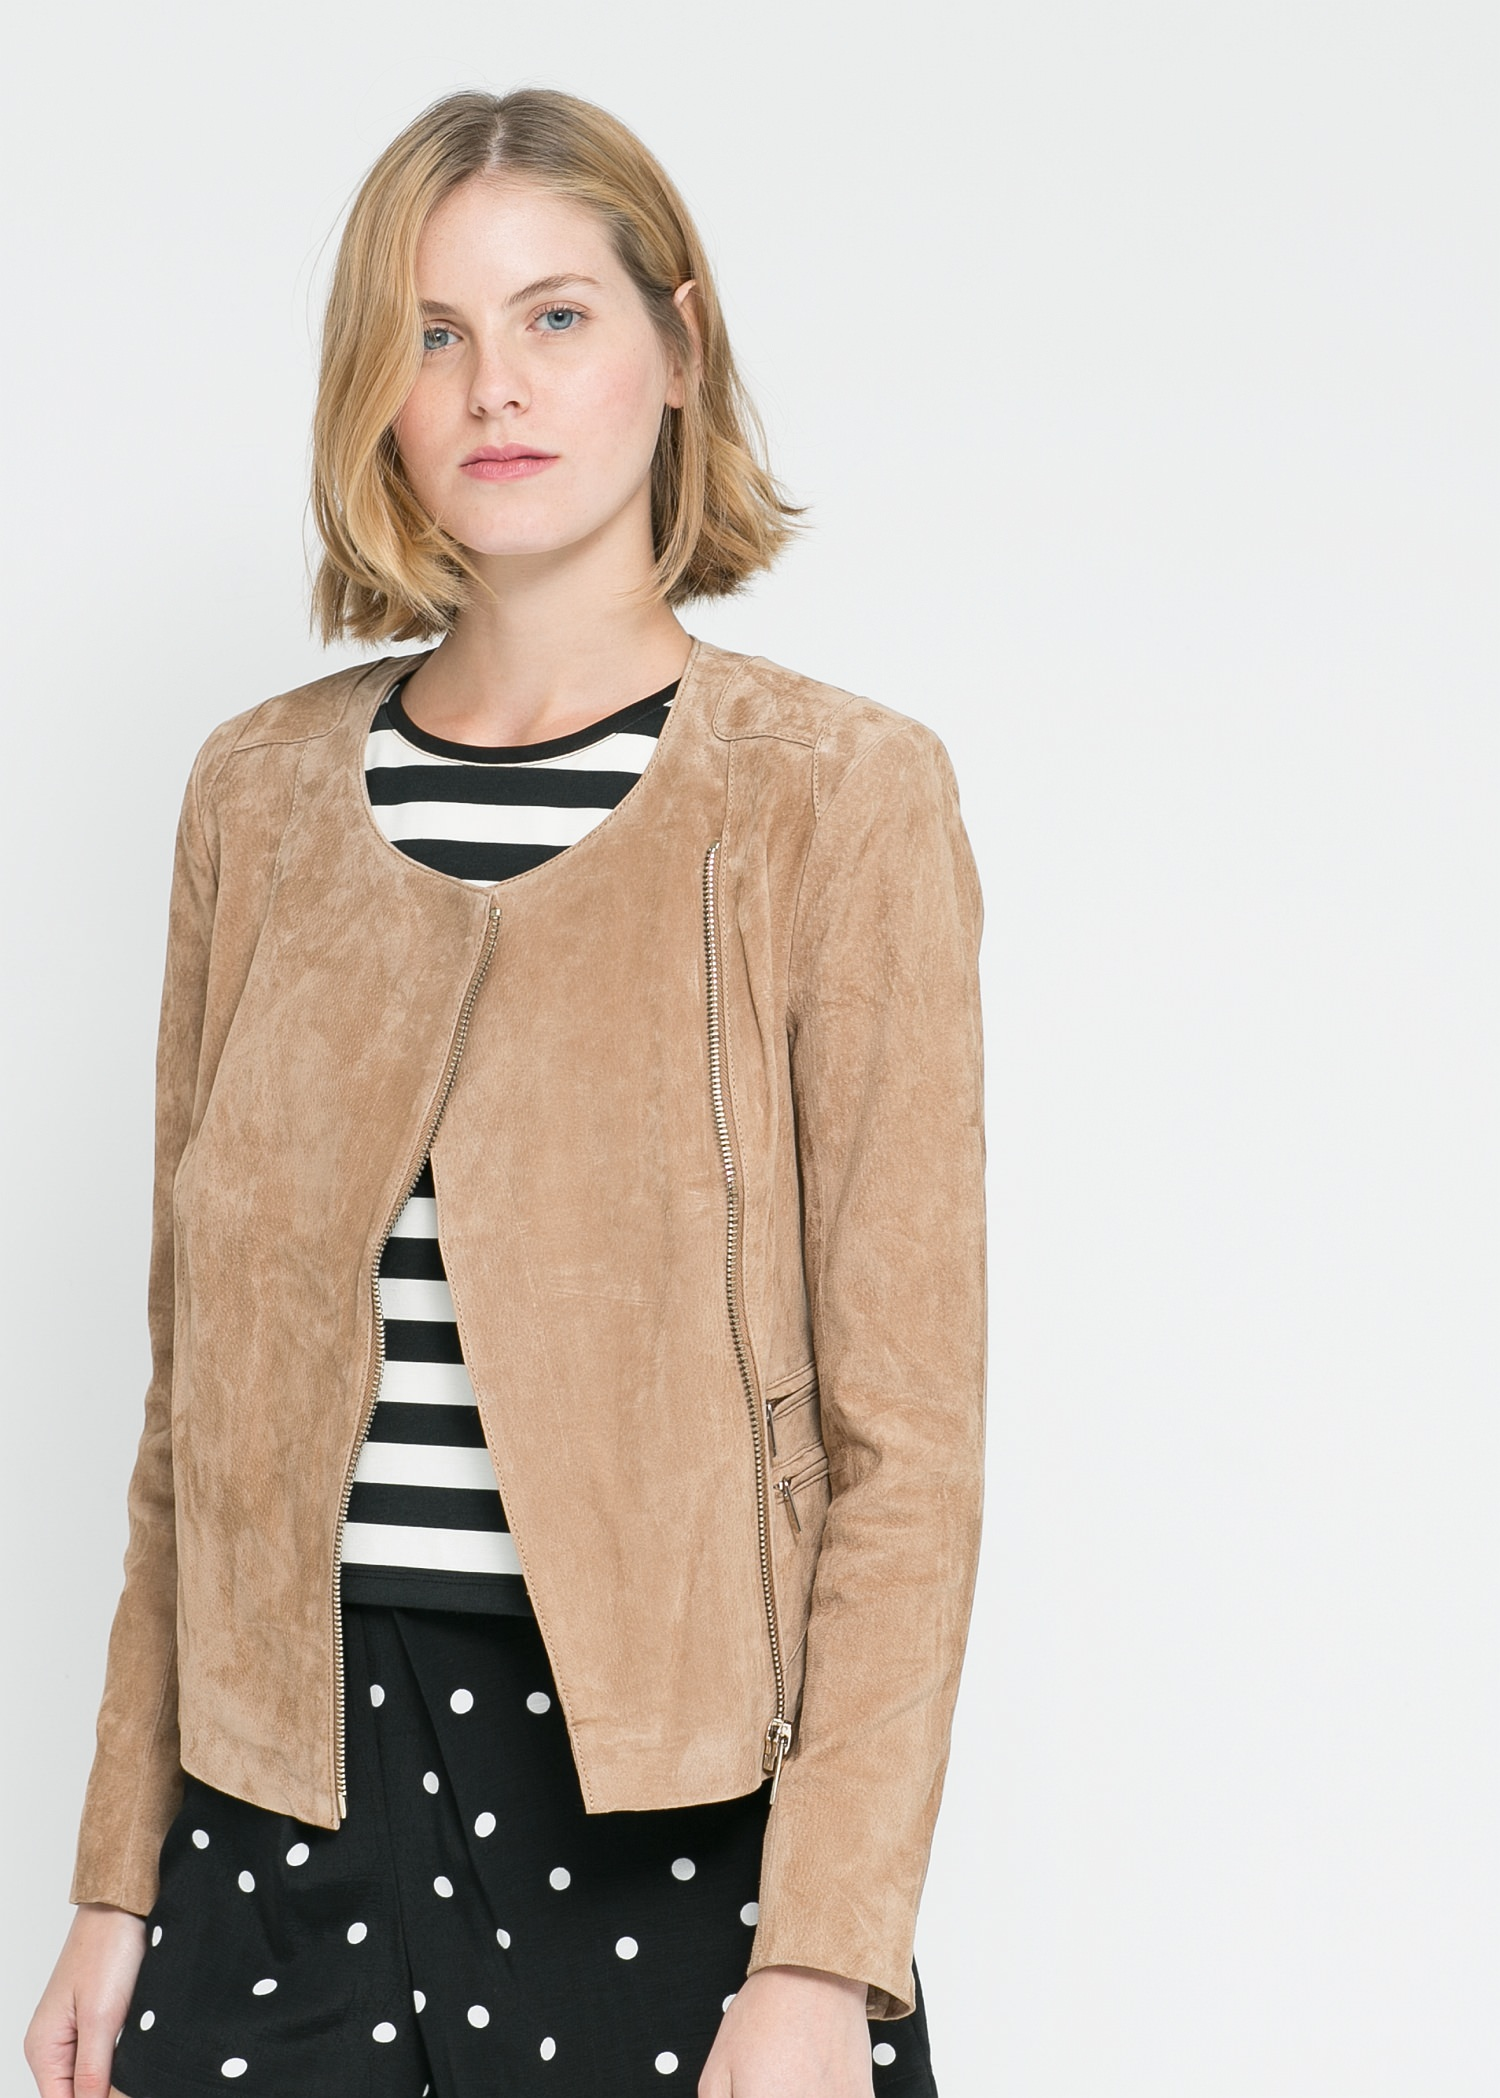 Peccary leather jacket